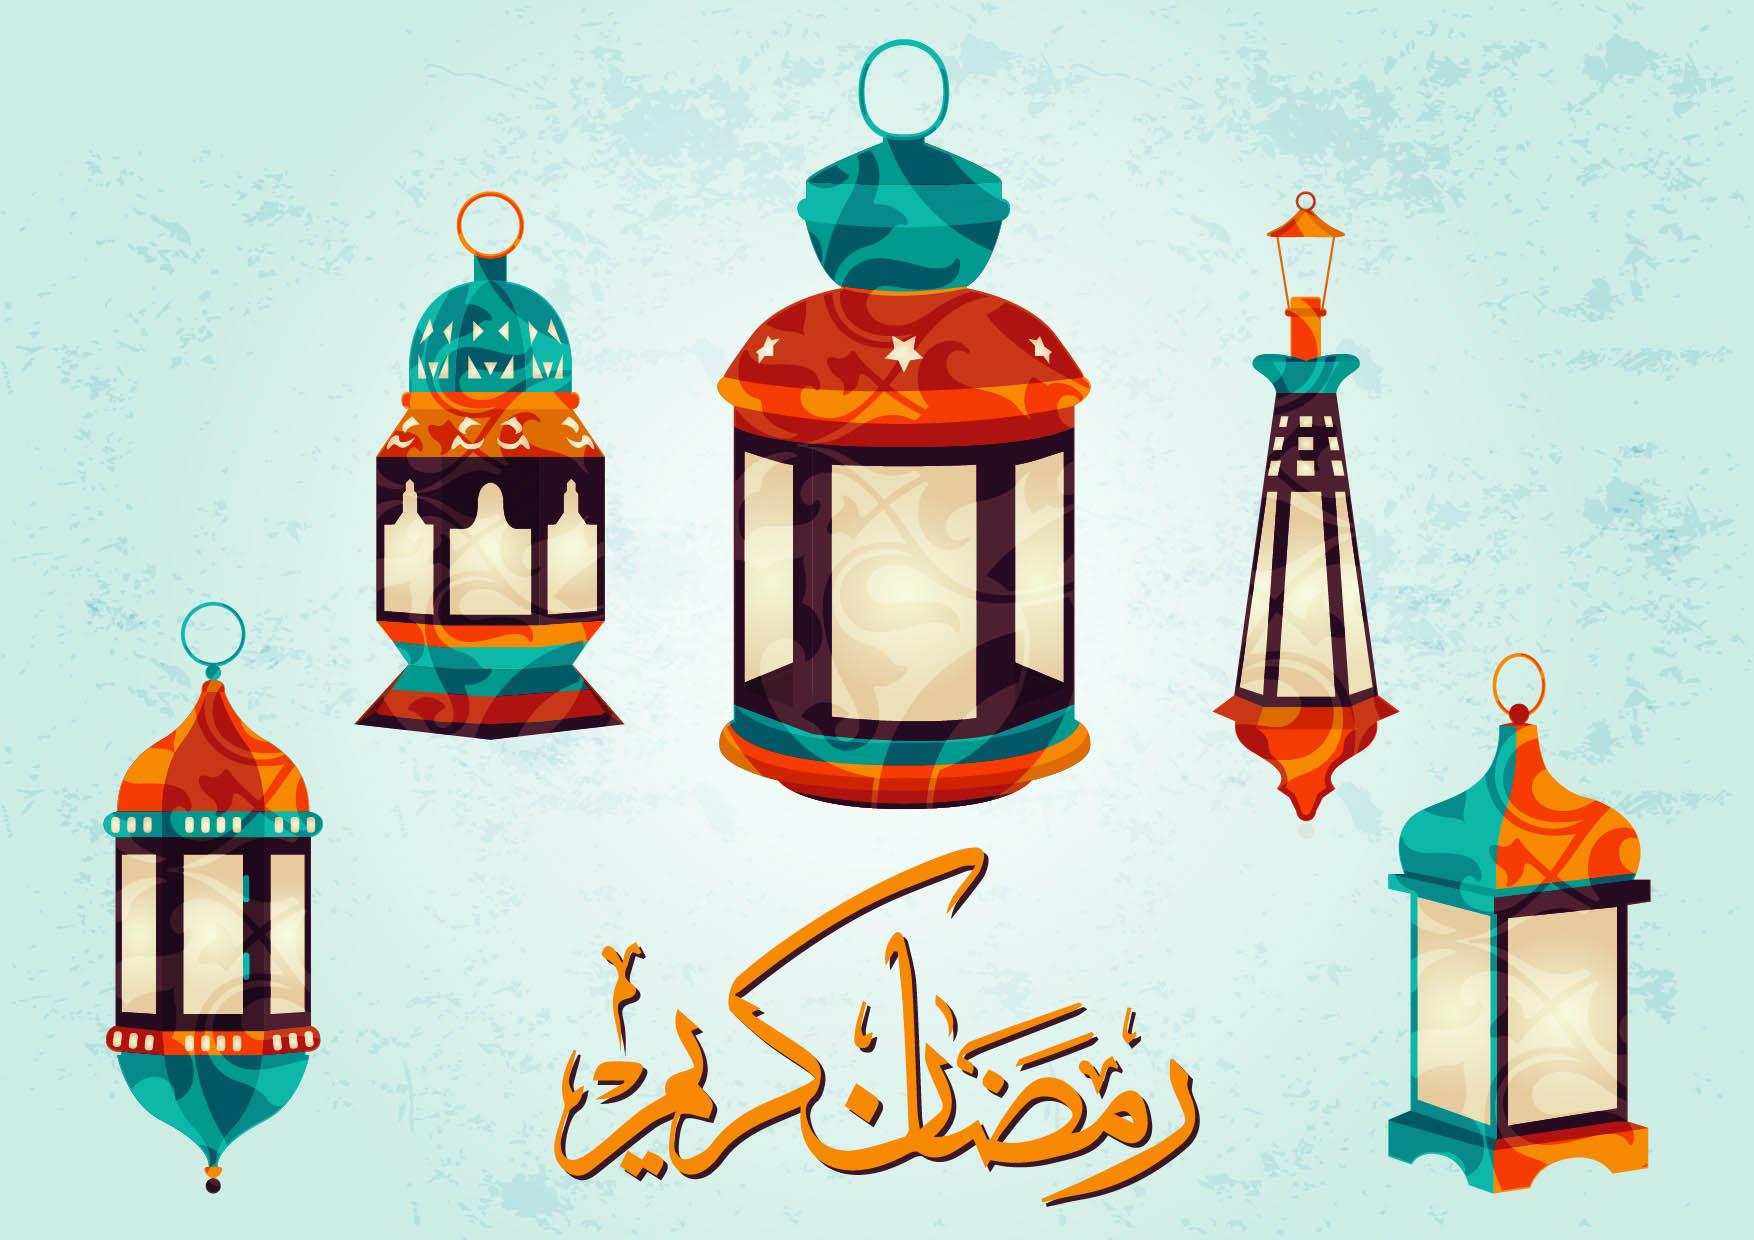 Wasting Time Quotes Wallpaper Ramadan Mubarak Wallpaper 2019